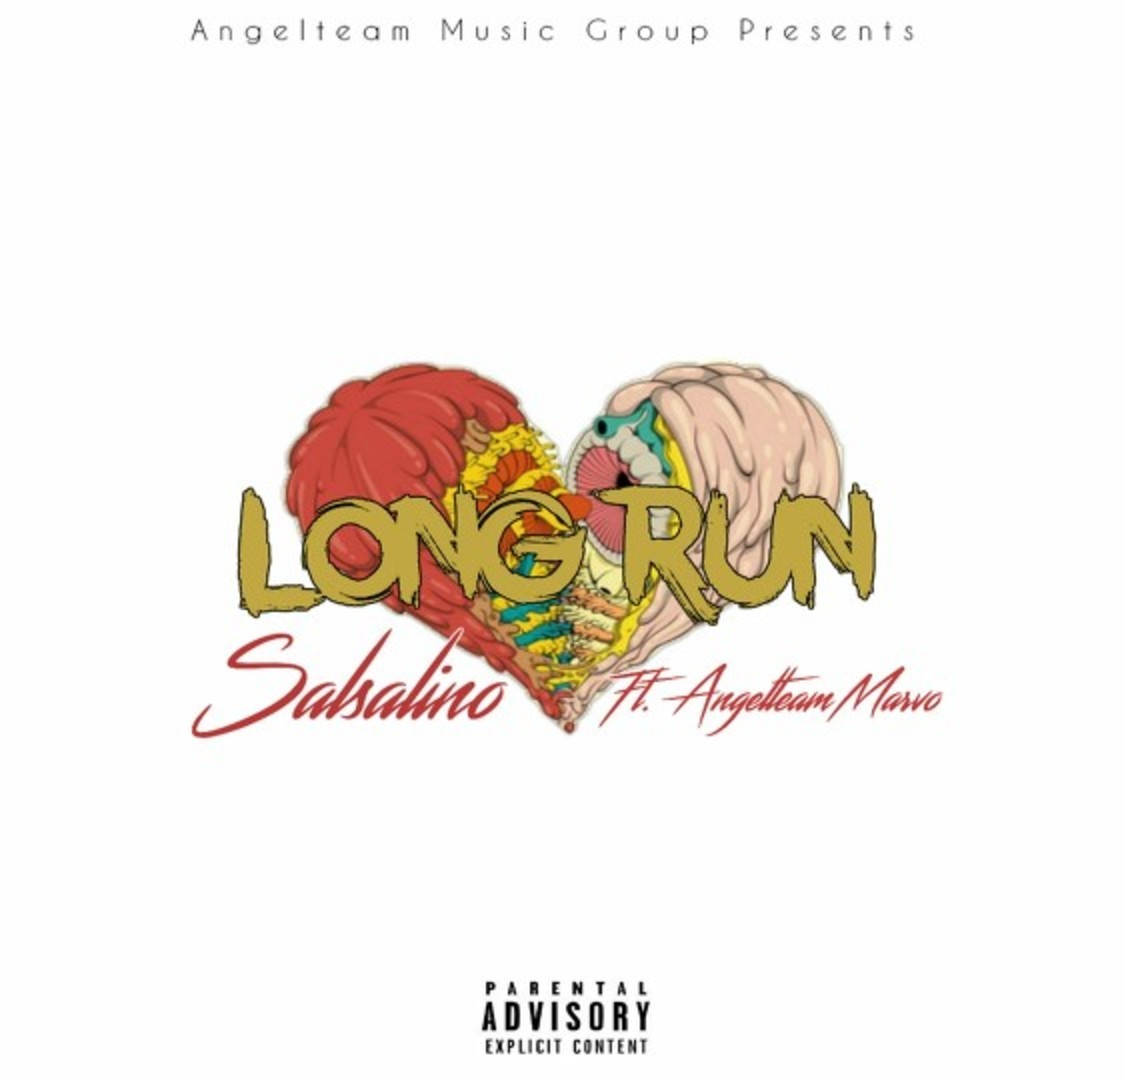 Salsalino ft. Angelteam Marvo - Long Run [Thizzler.com Exclusive]